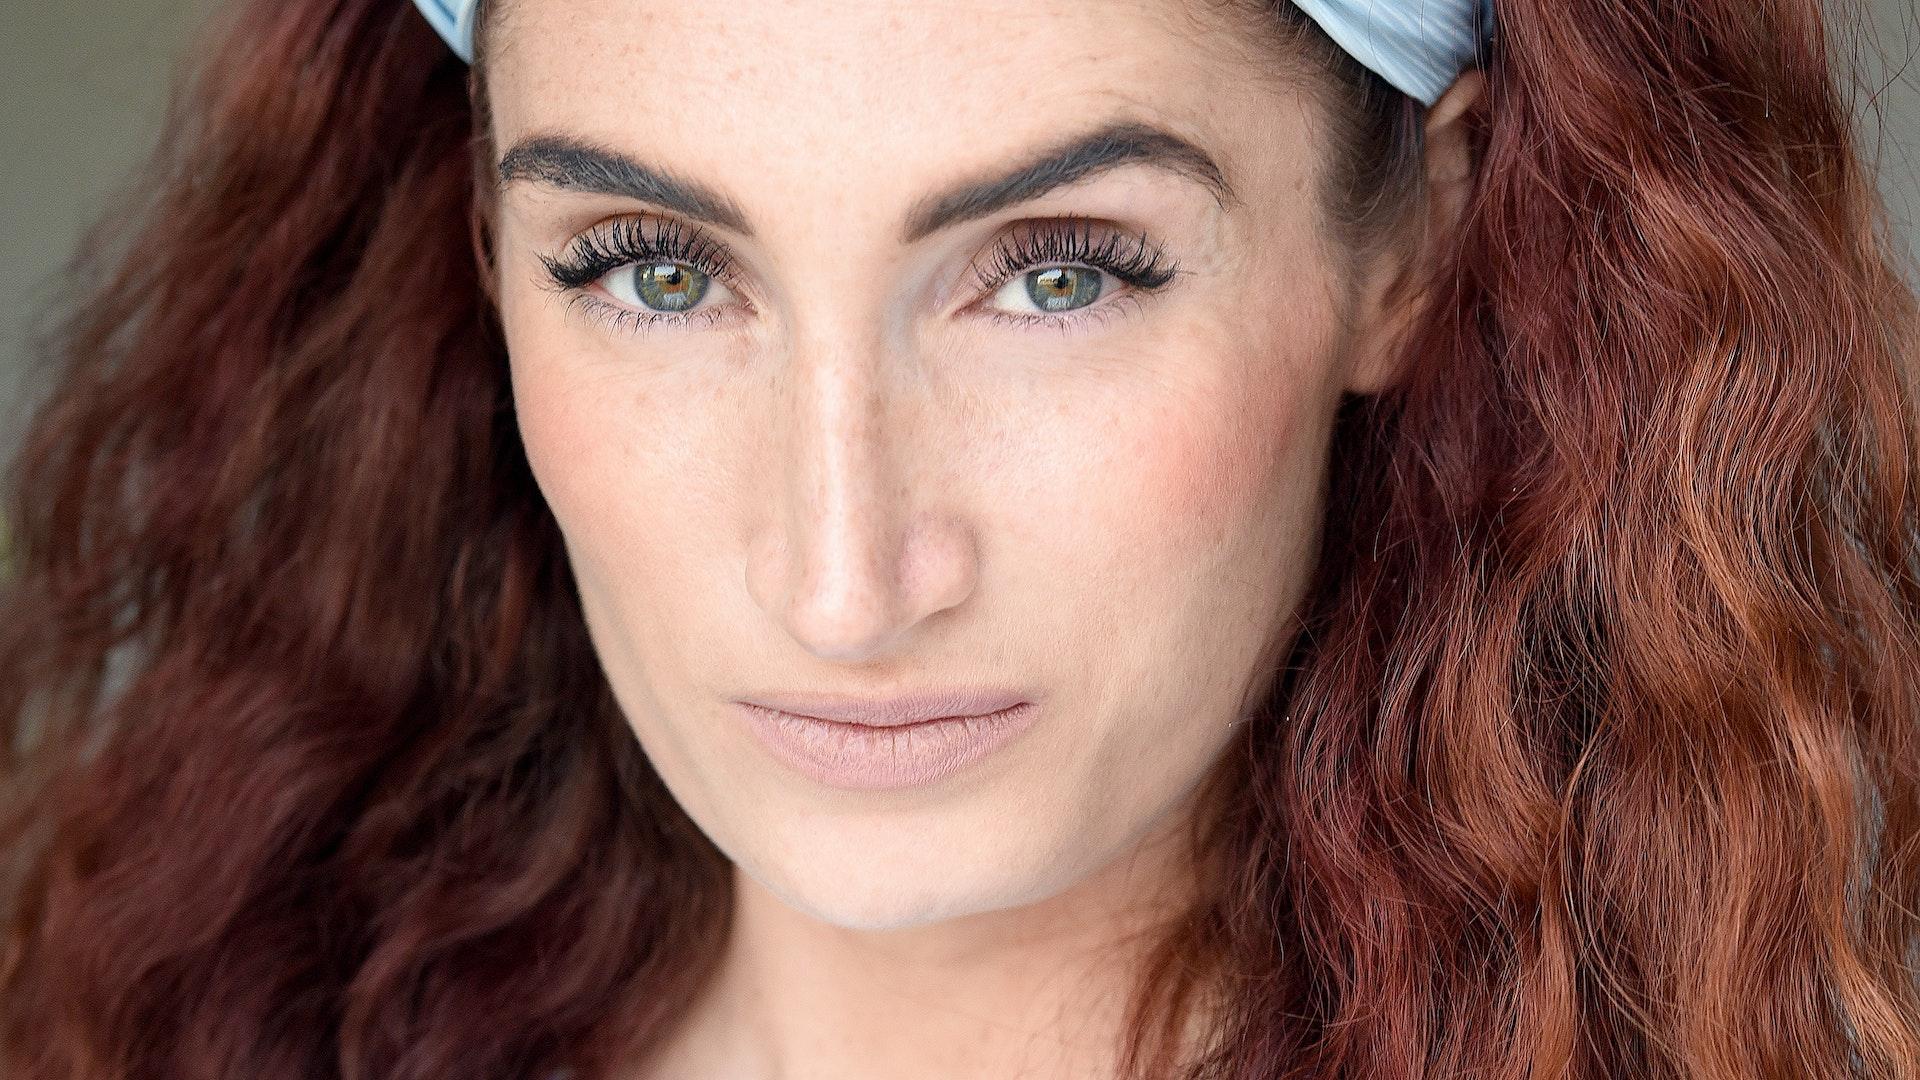 Roxy Haylock